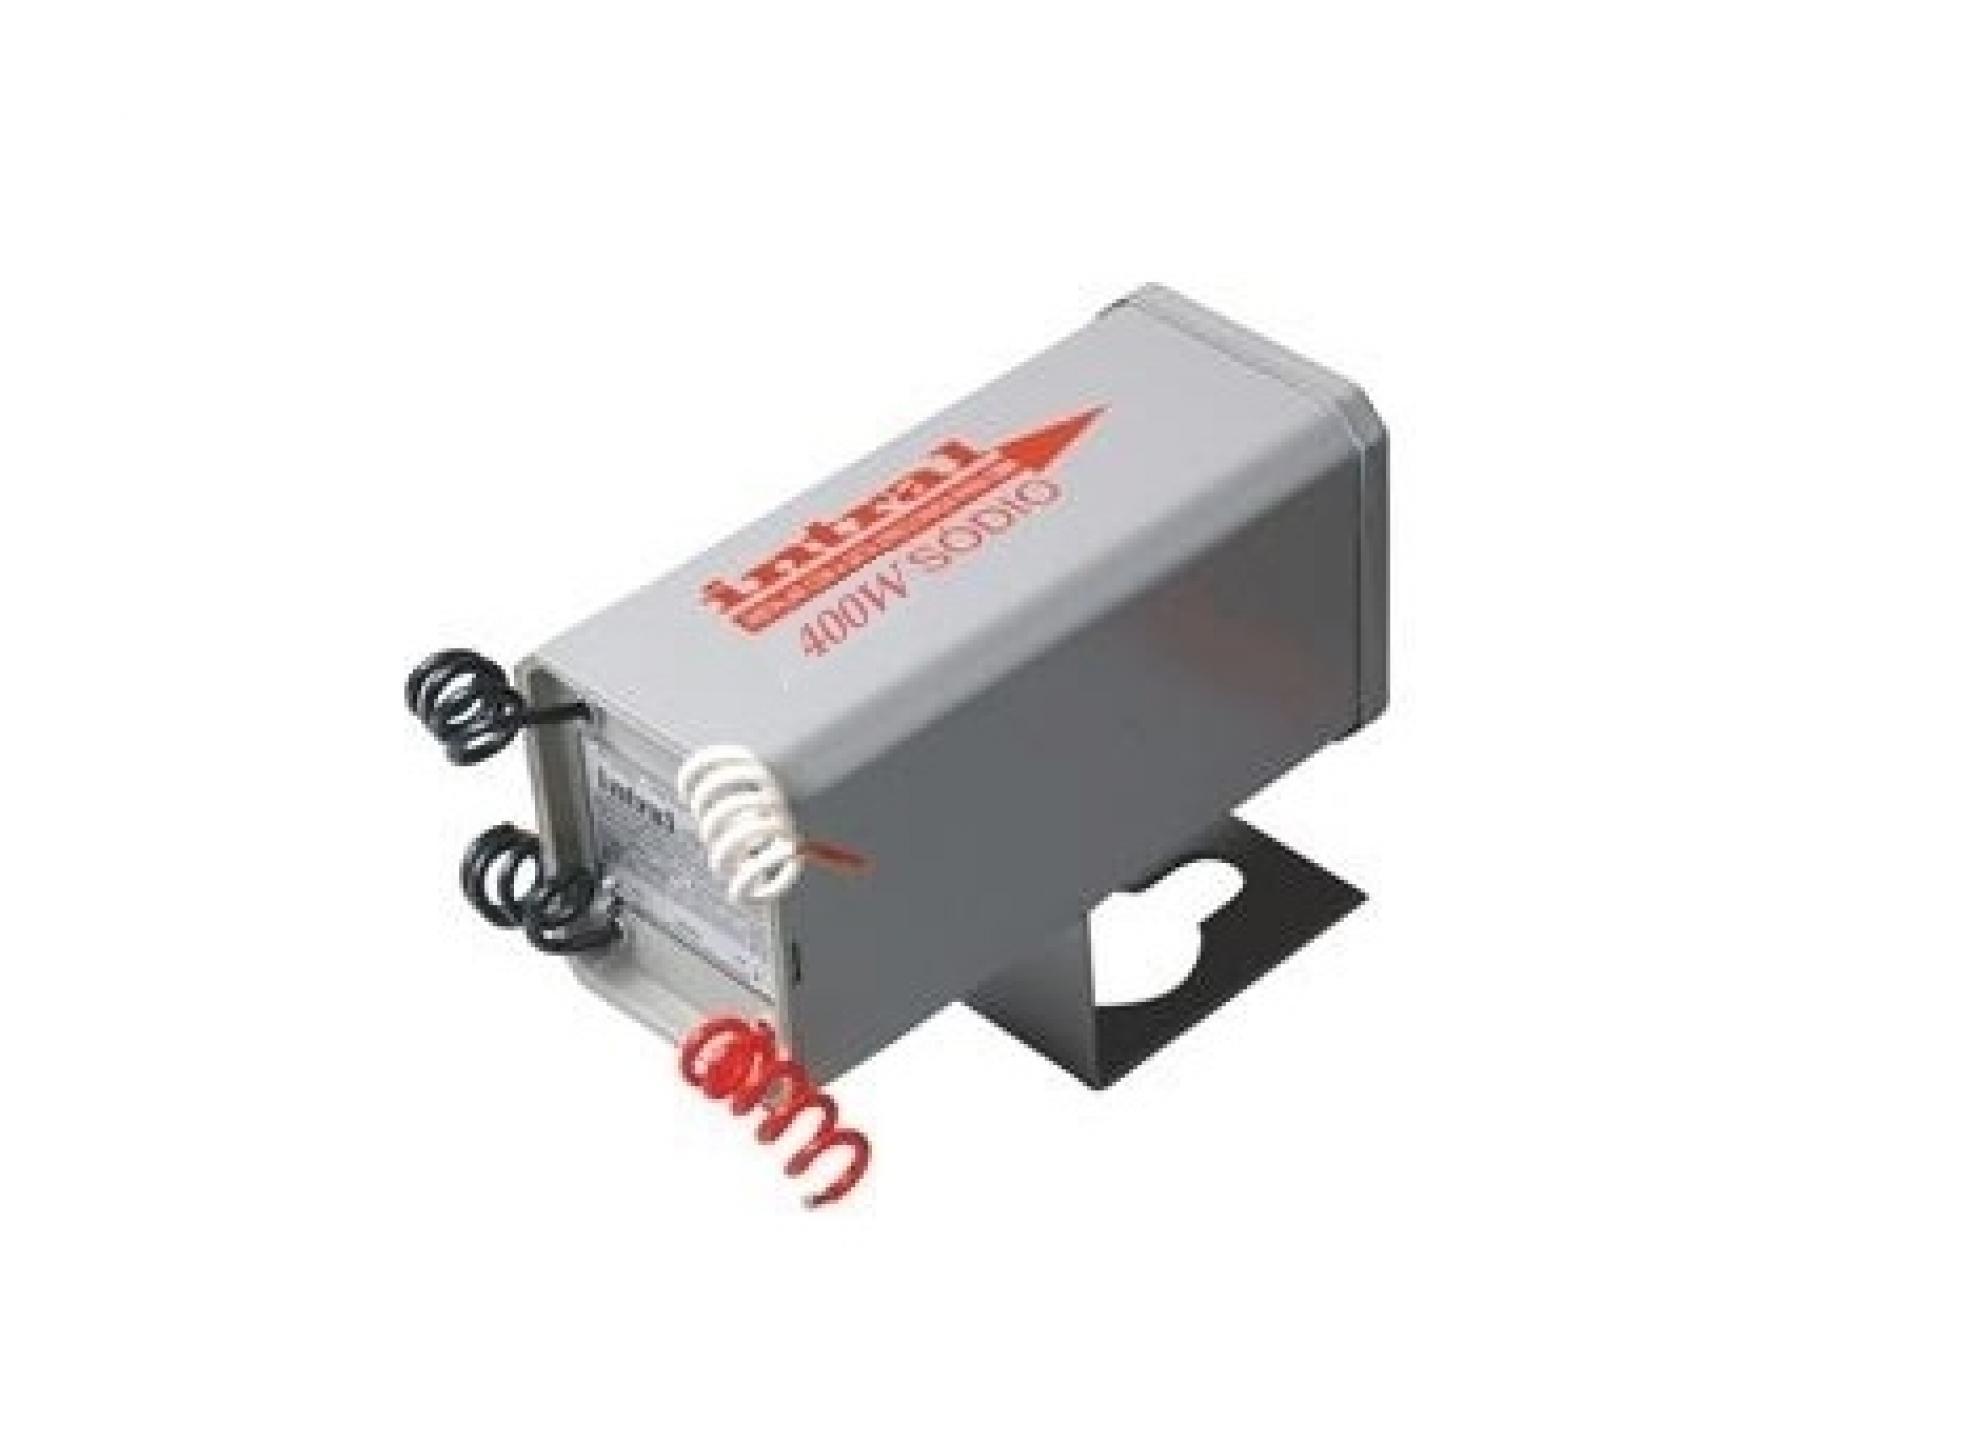 Reator vapor metalico sodio externo 400W